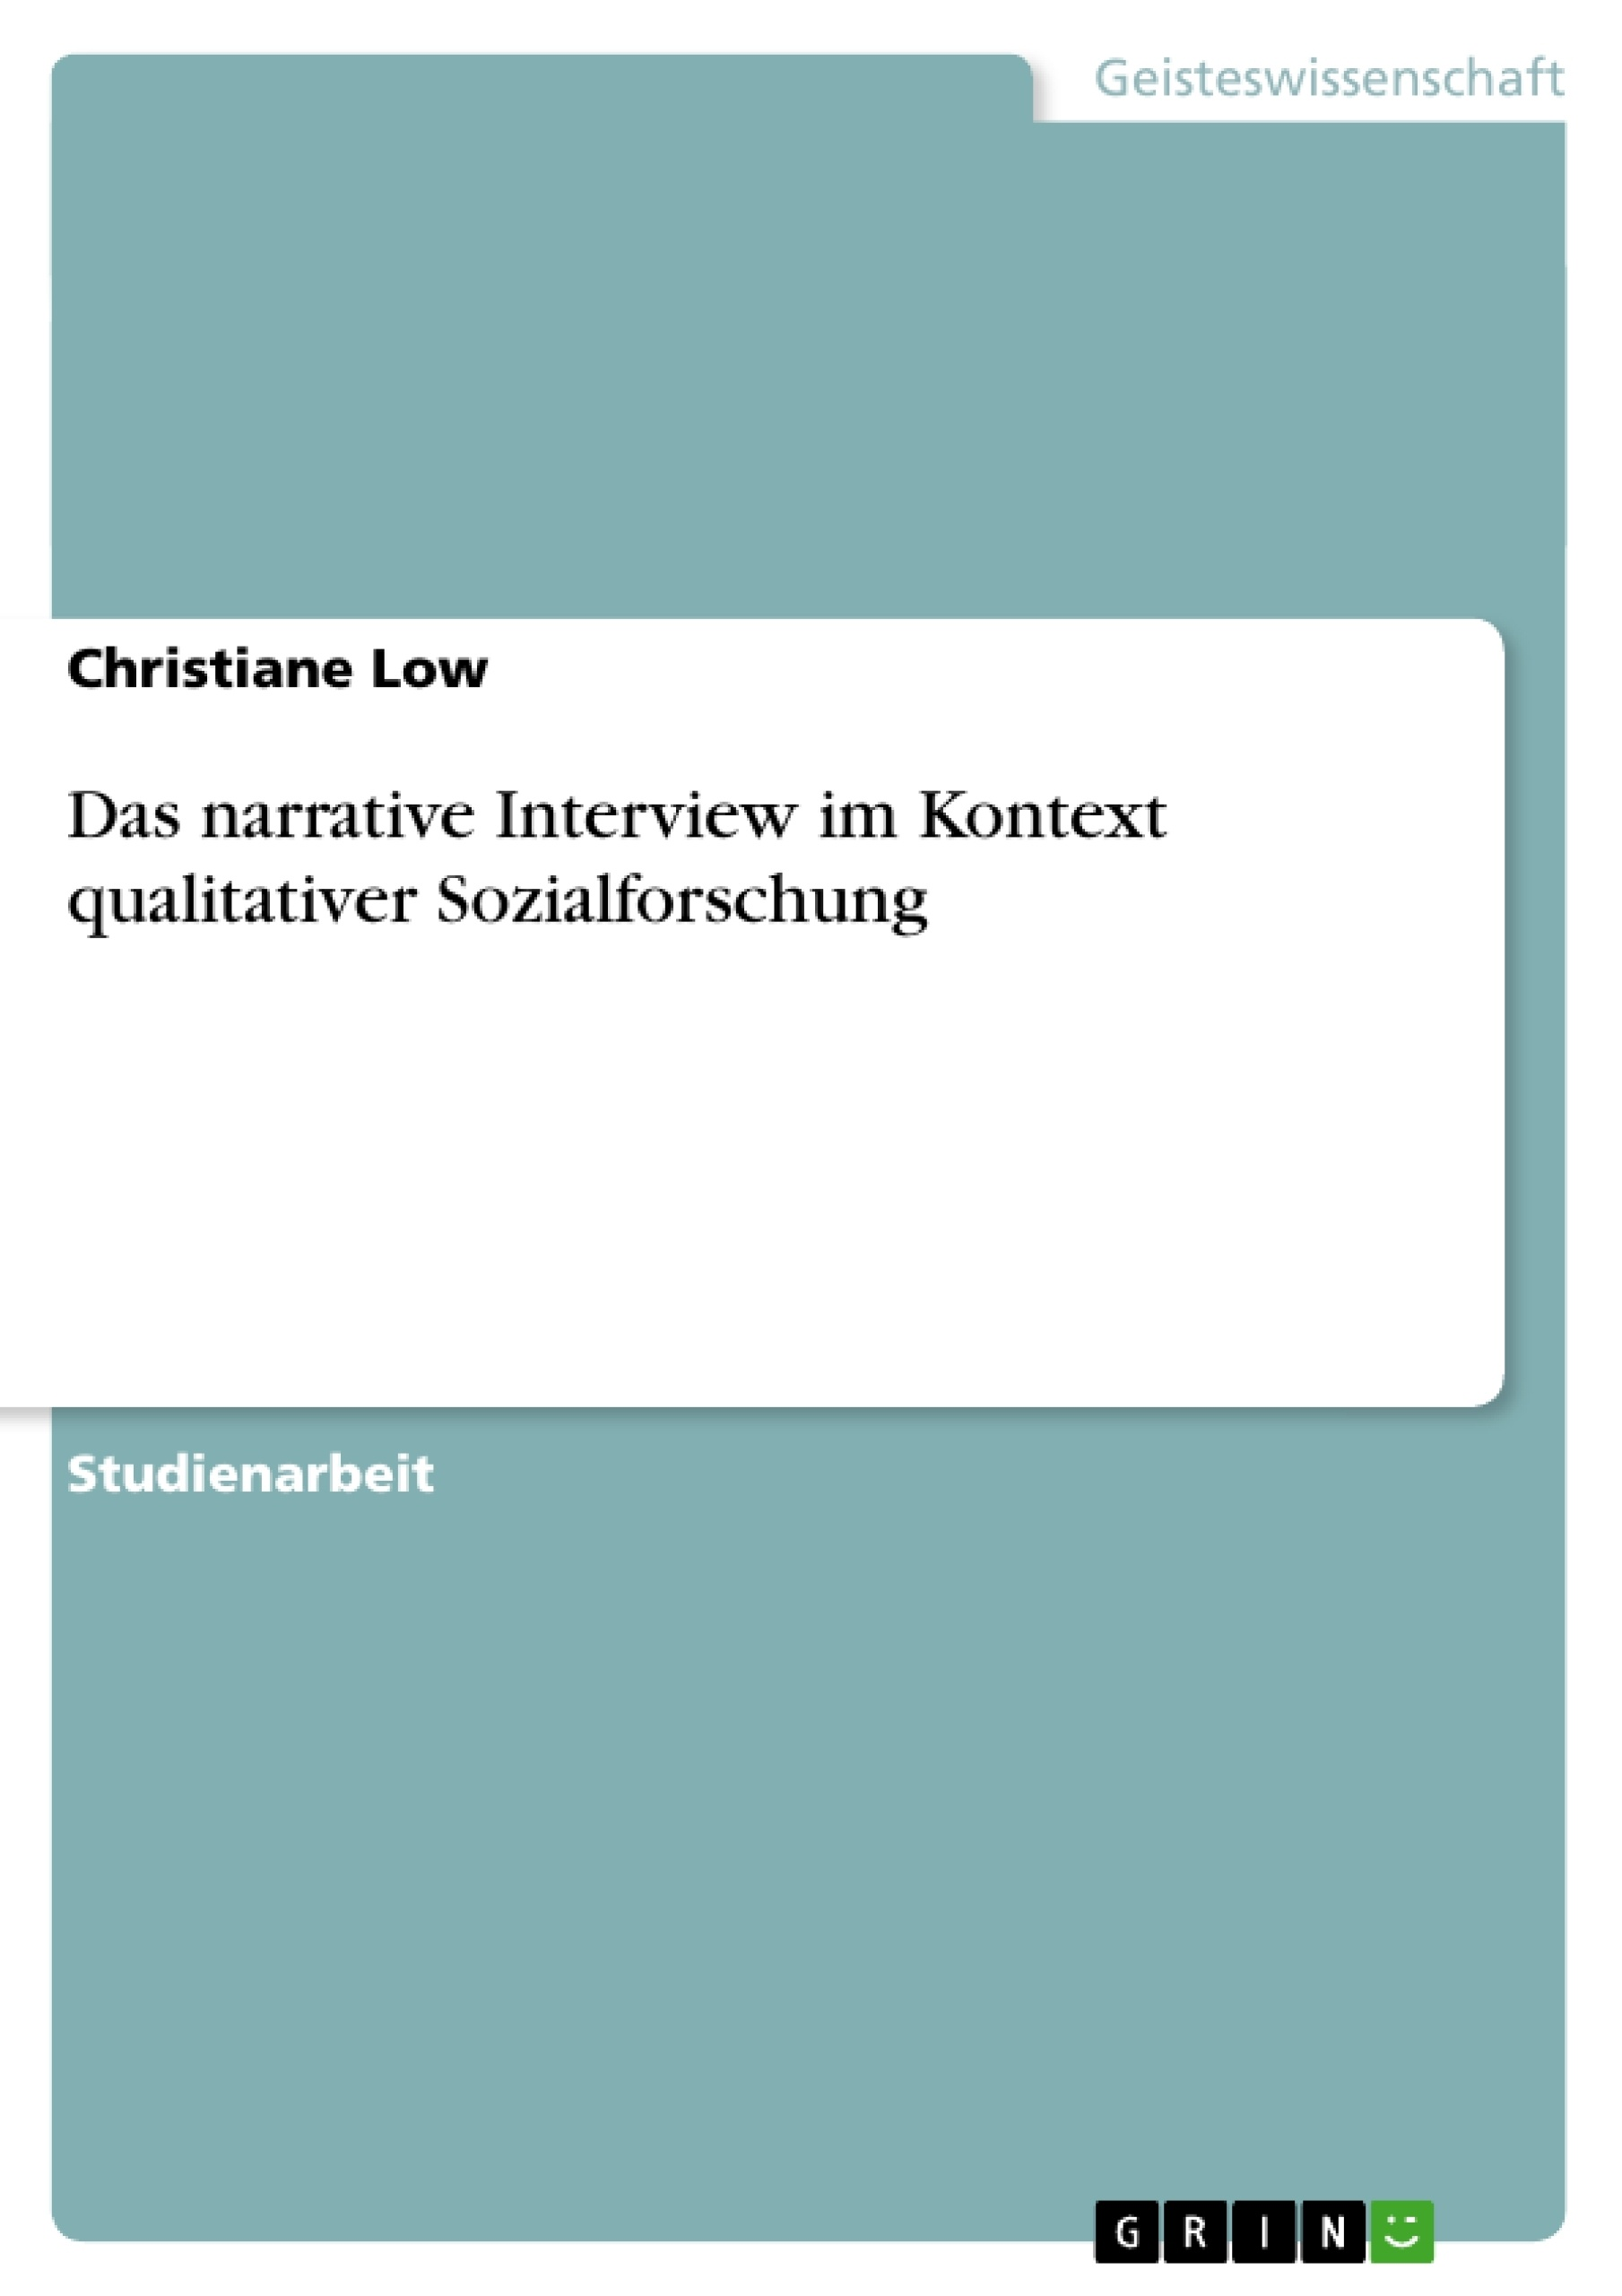 Titel: Das narrative Interview im Kontext qualitativer Sozialforschung